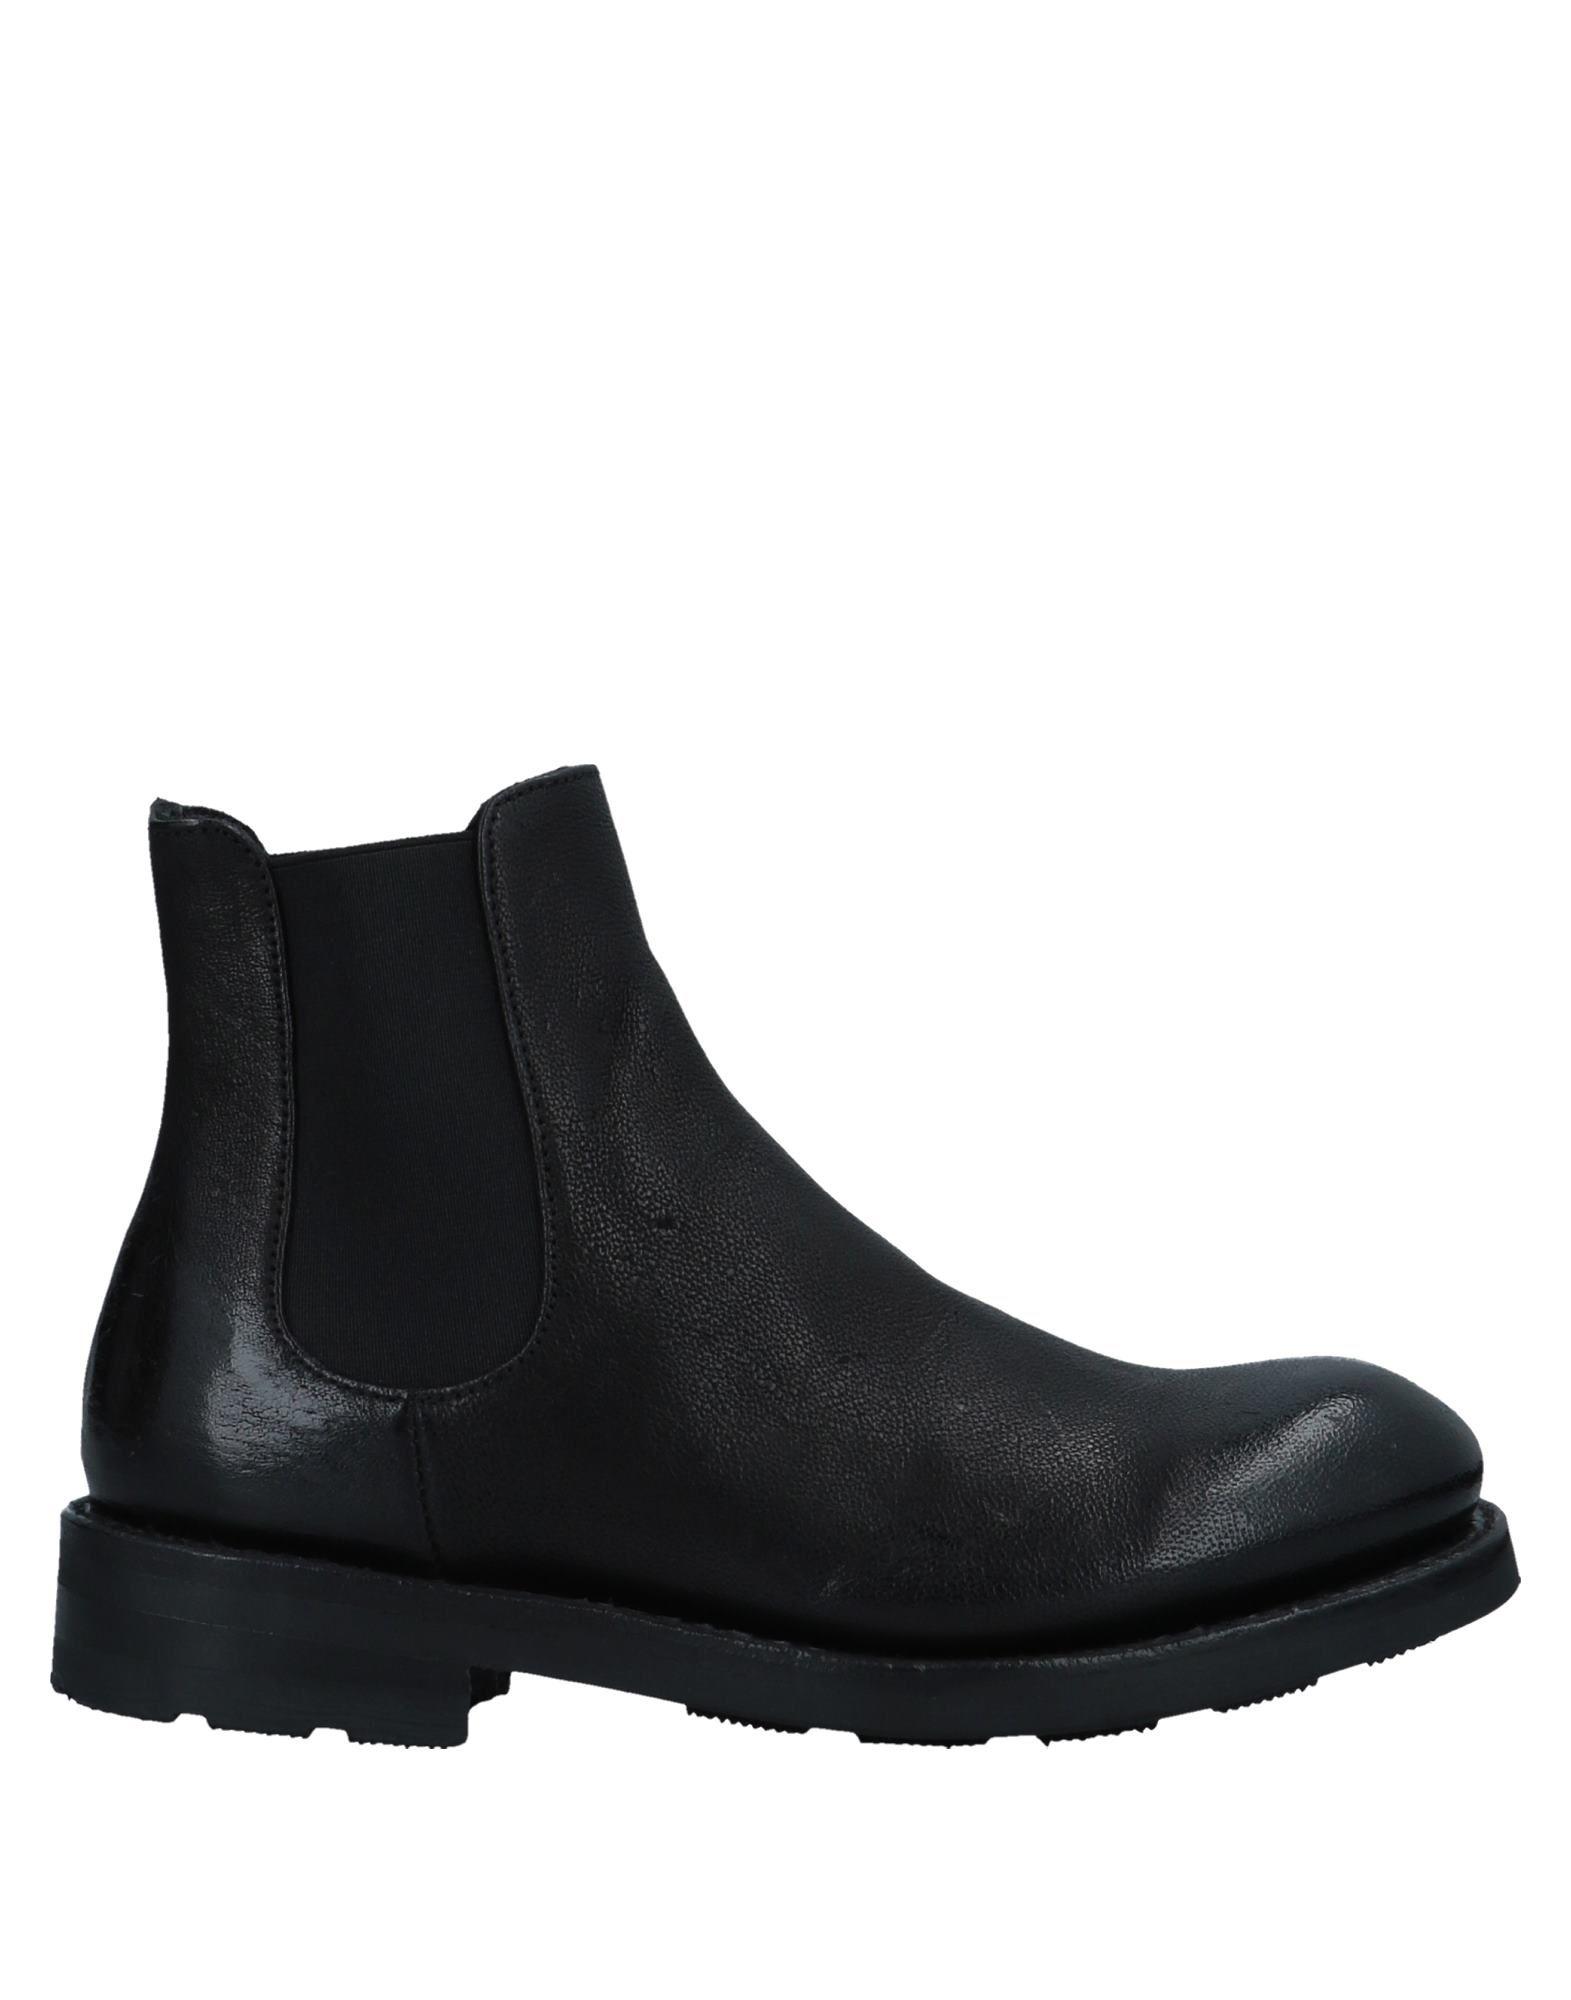 ECCO x THE LAST CONSPIRACY Полусапоги и высокие ботинки ecco ecco ecco 9034017 00100 00101